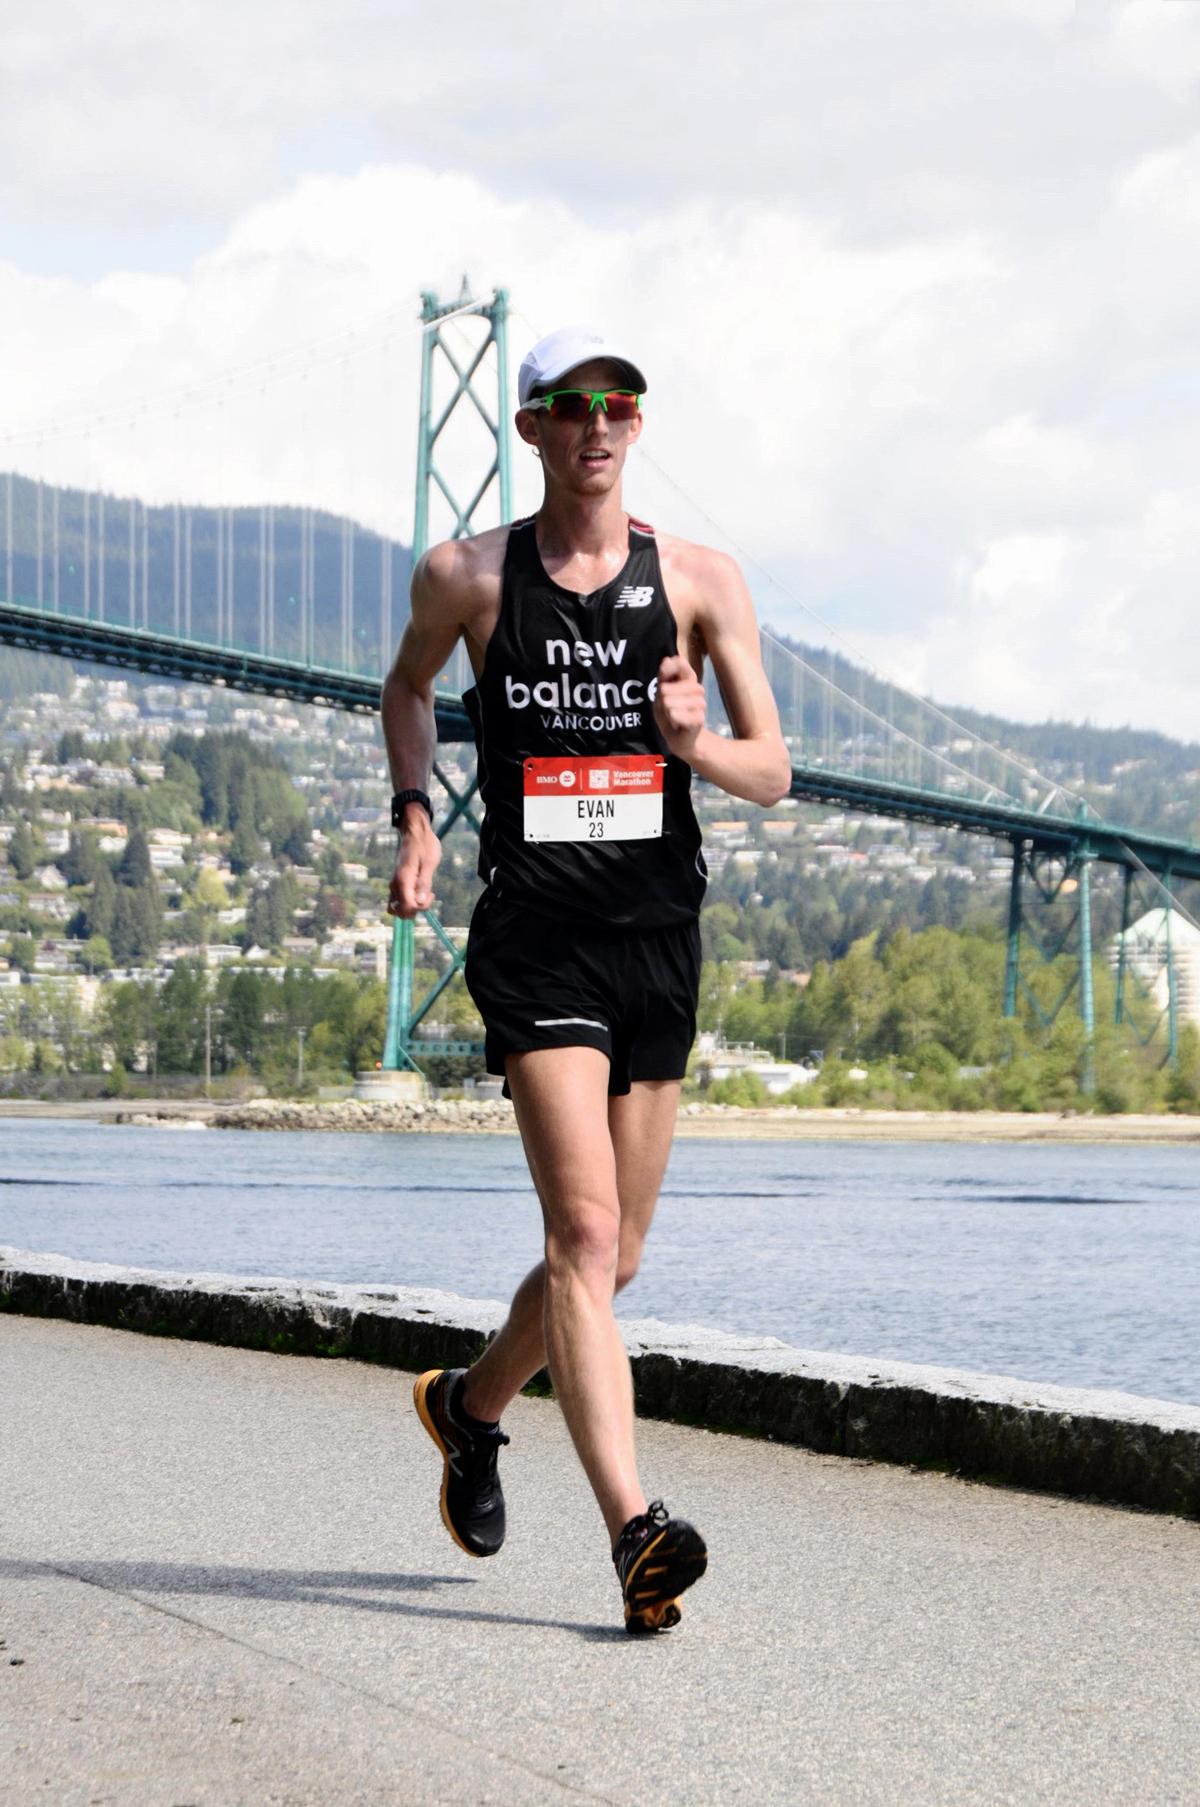 43-2017.EvanDunfee-LionsGate-VancouverMarathon-MarathonFoto-RUNVAN-web